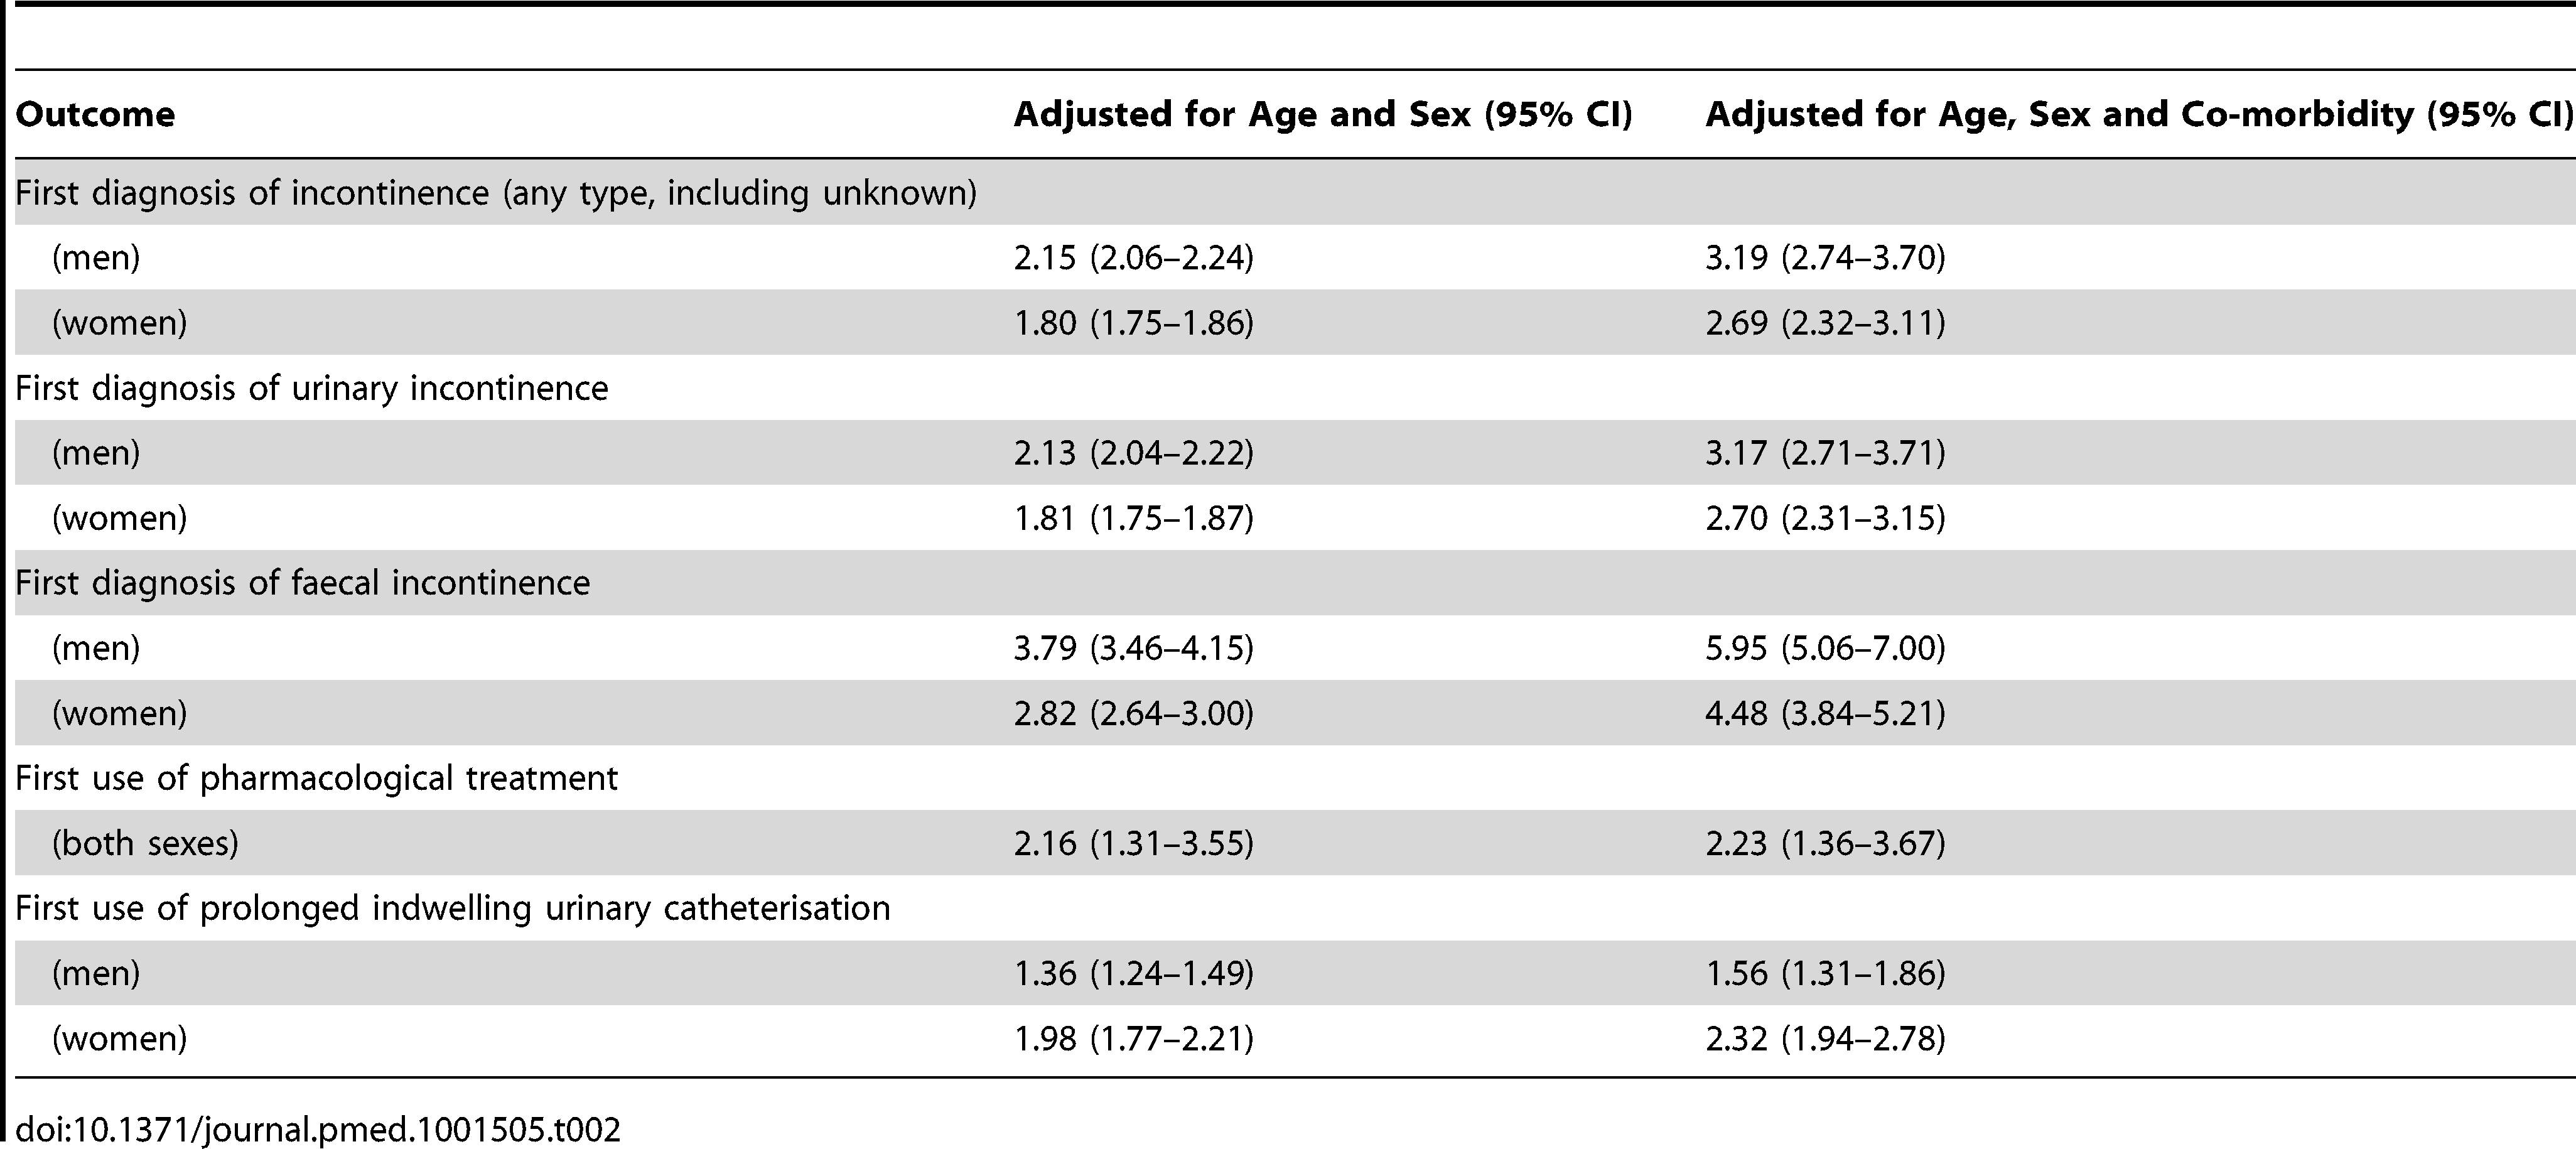 Rate ratios, comparing the dementia and non-dementia cohorts.